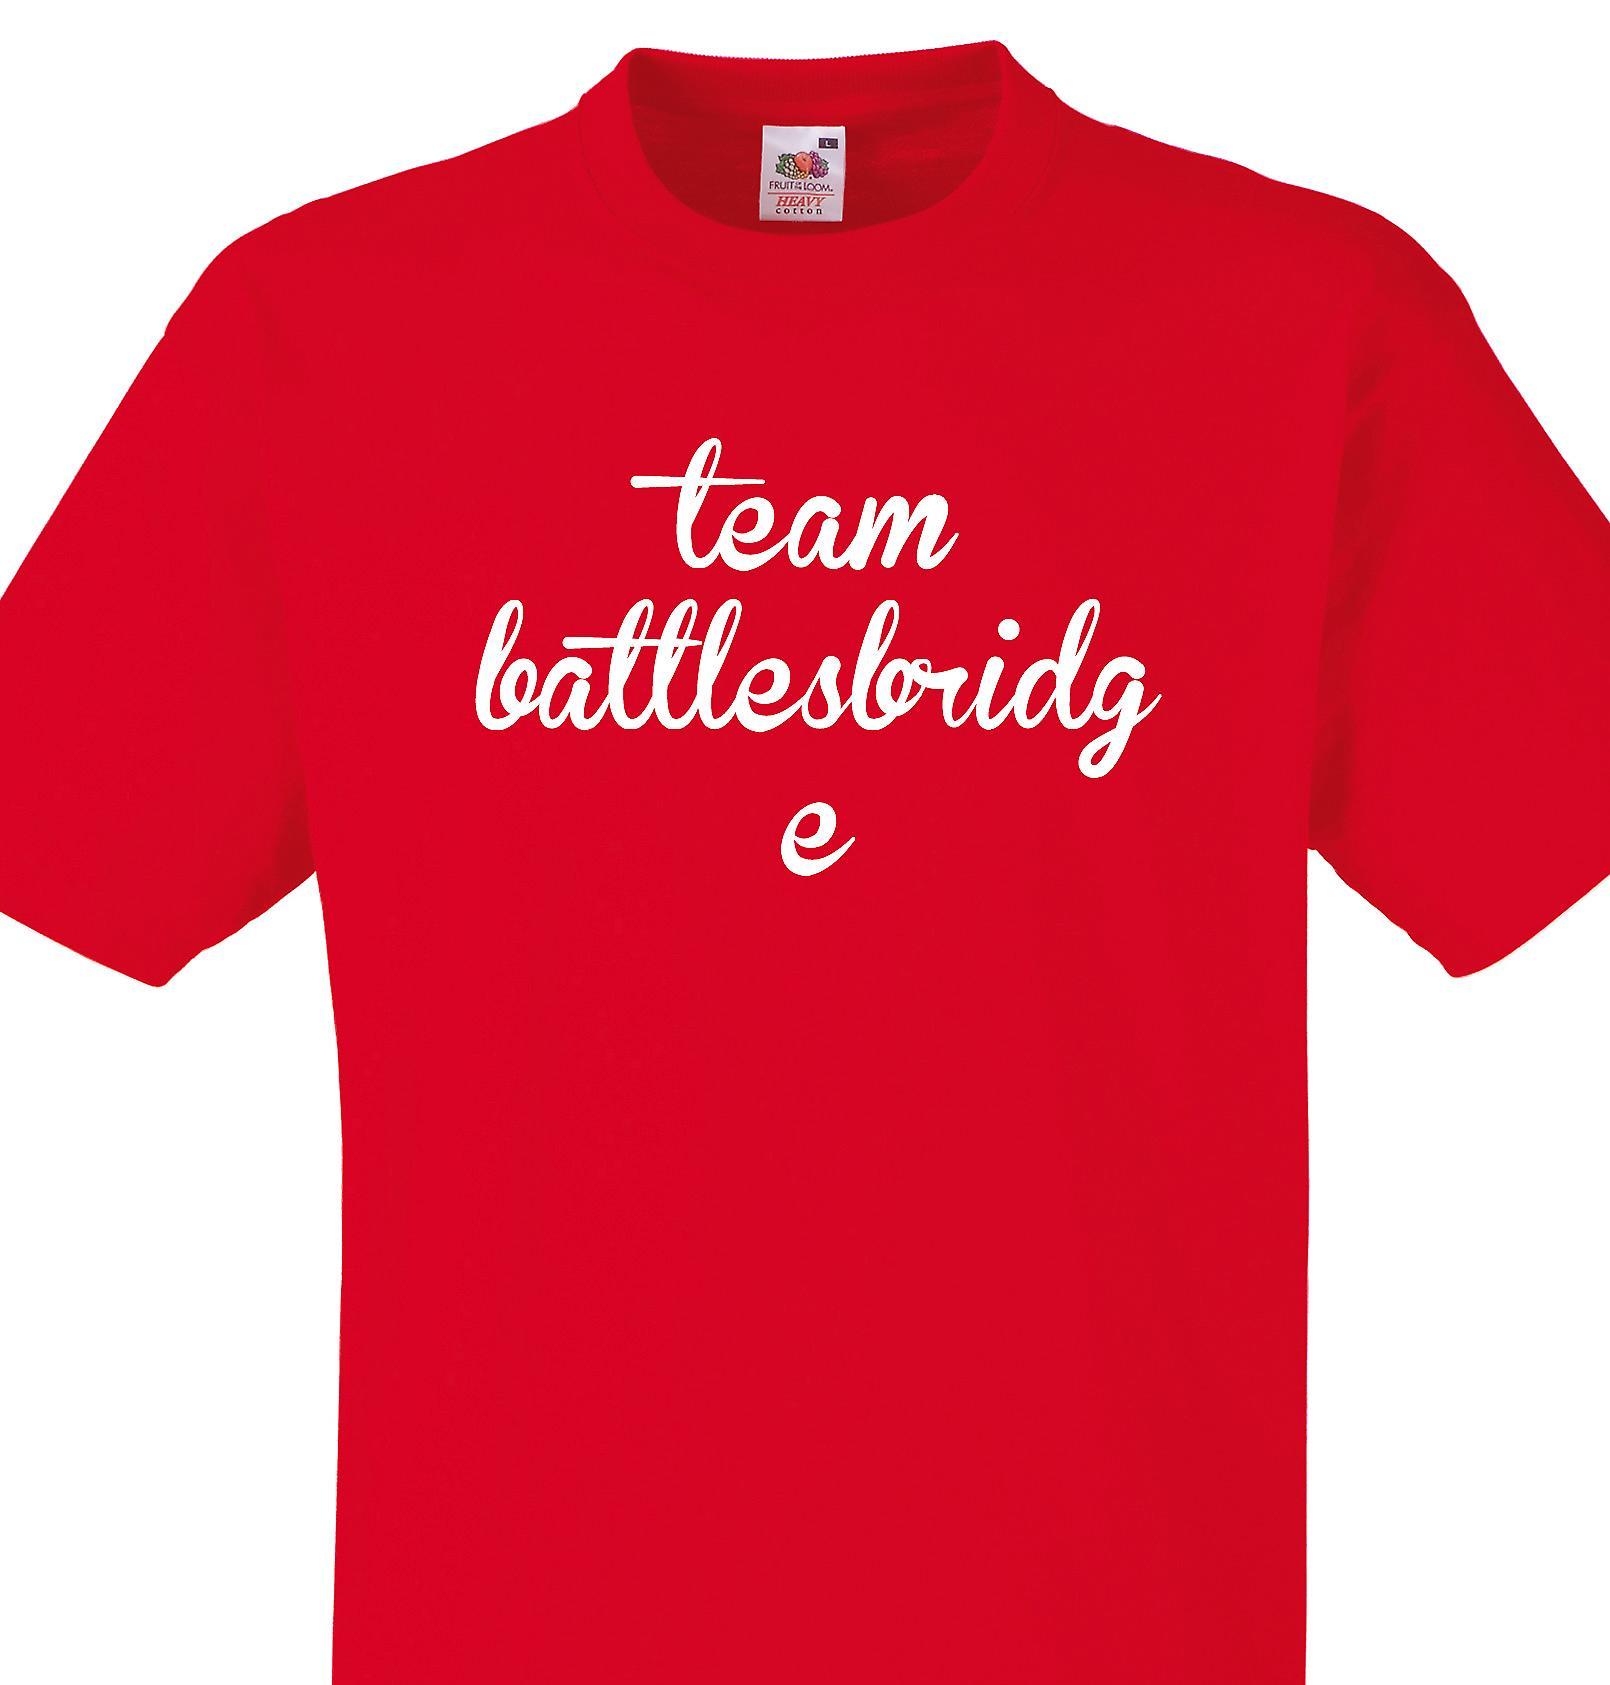 Team Battlesbridge Red T shirt